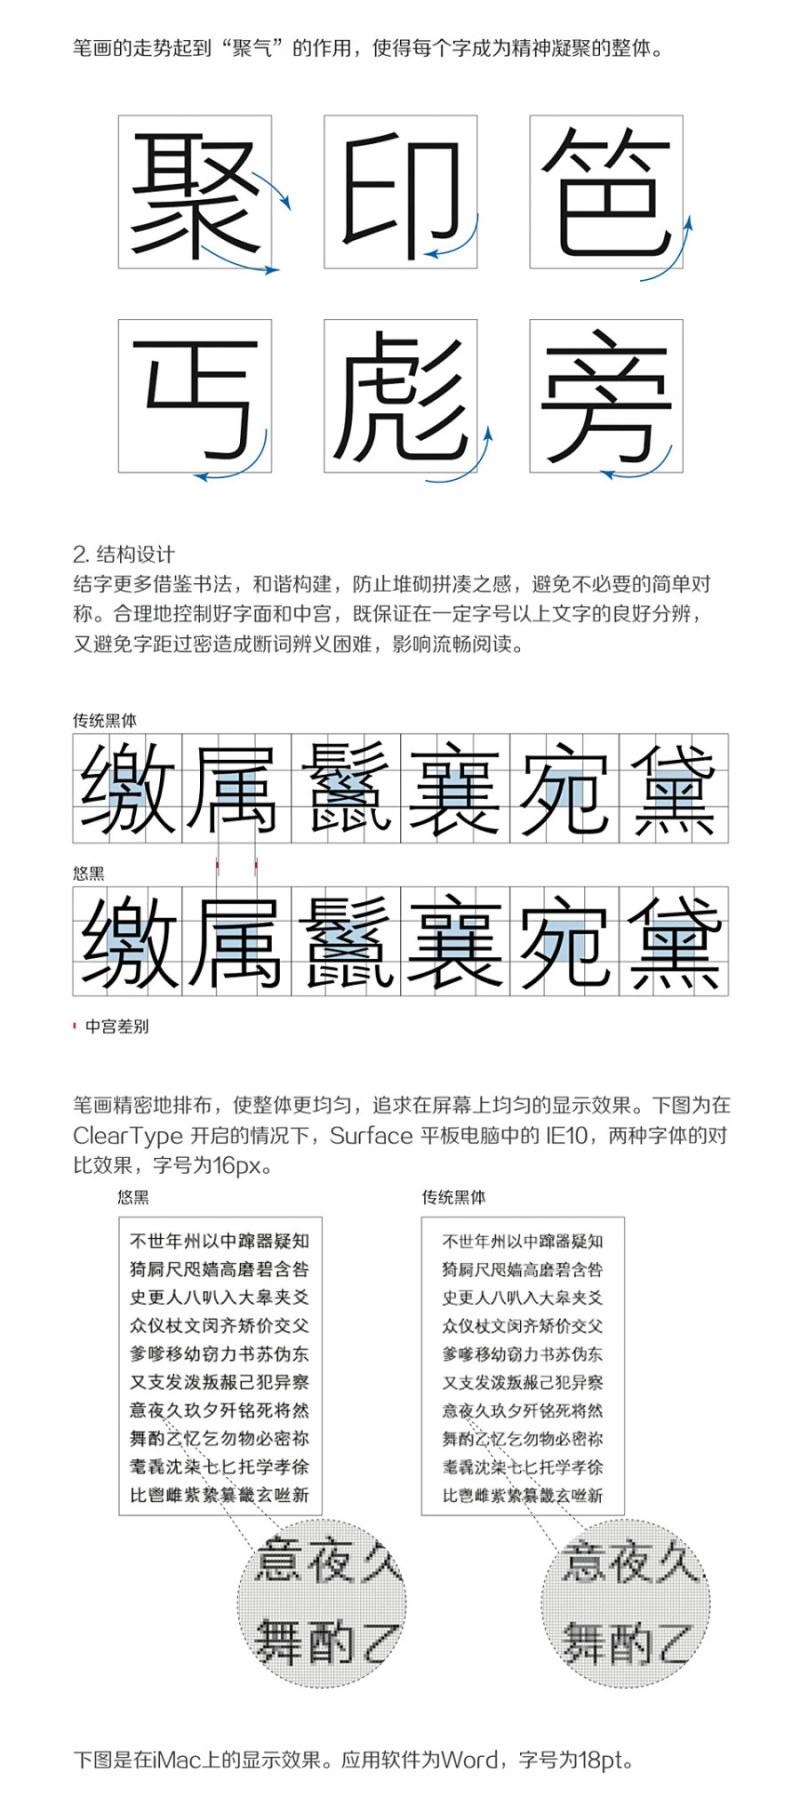 https://cdn1.zijia.com.cn/Public/Uploads/mainsort/mainsort_1600937115_6917.jpg